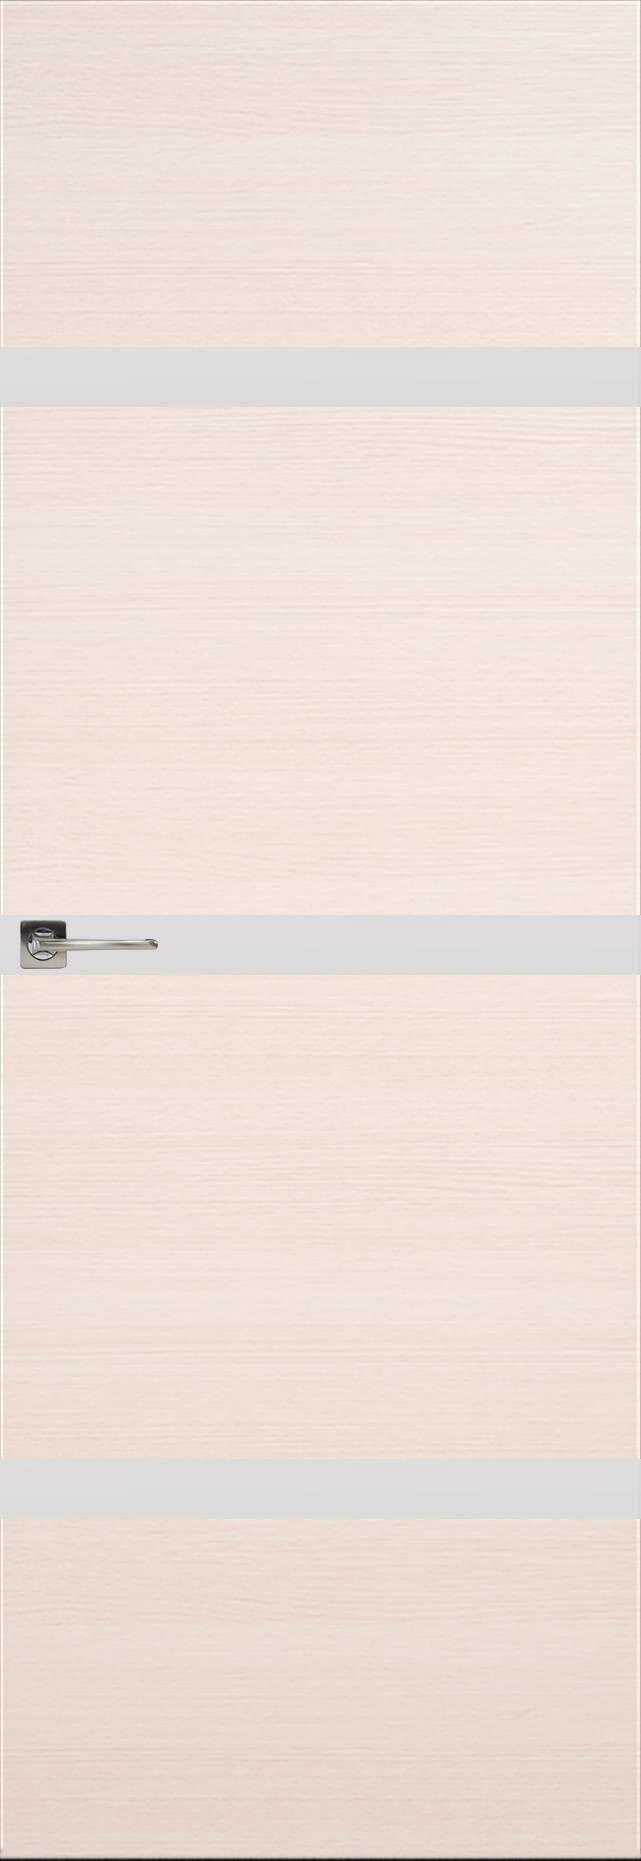 Tivoli Г-4 Invisible цвет - Беленый дуб Без стекла (ДГ)